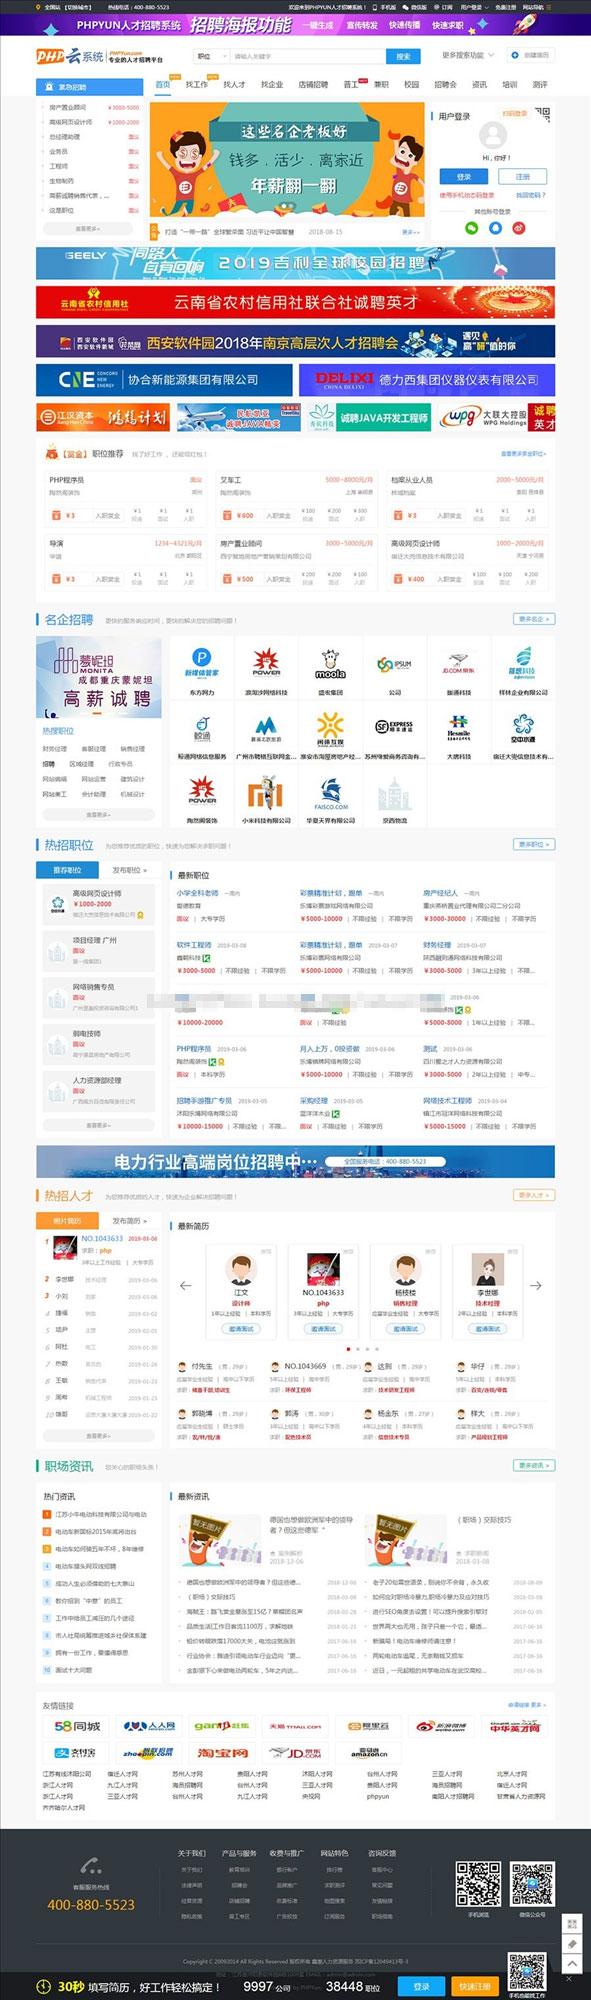 PHP云人才招聘系统授权版 v4.6 VIP版